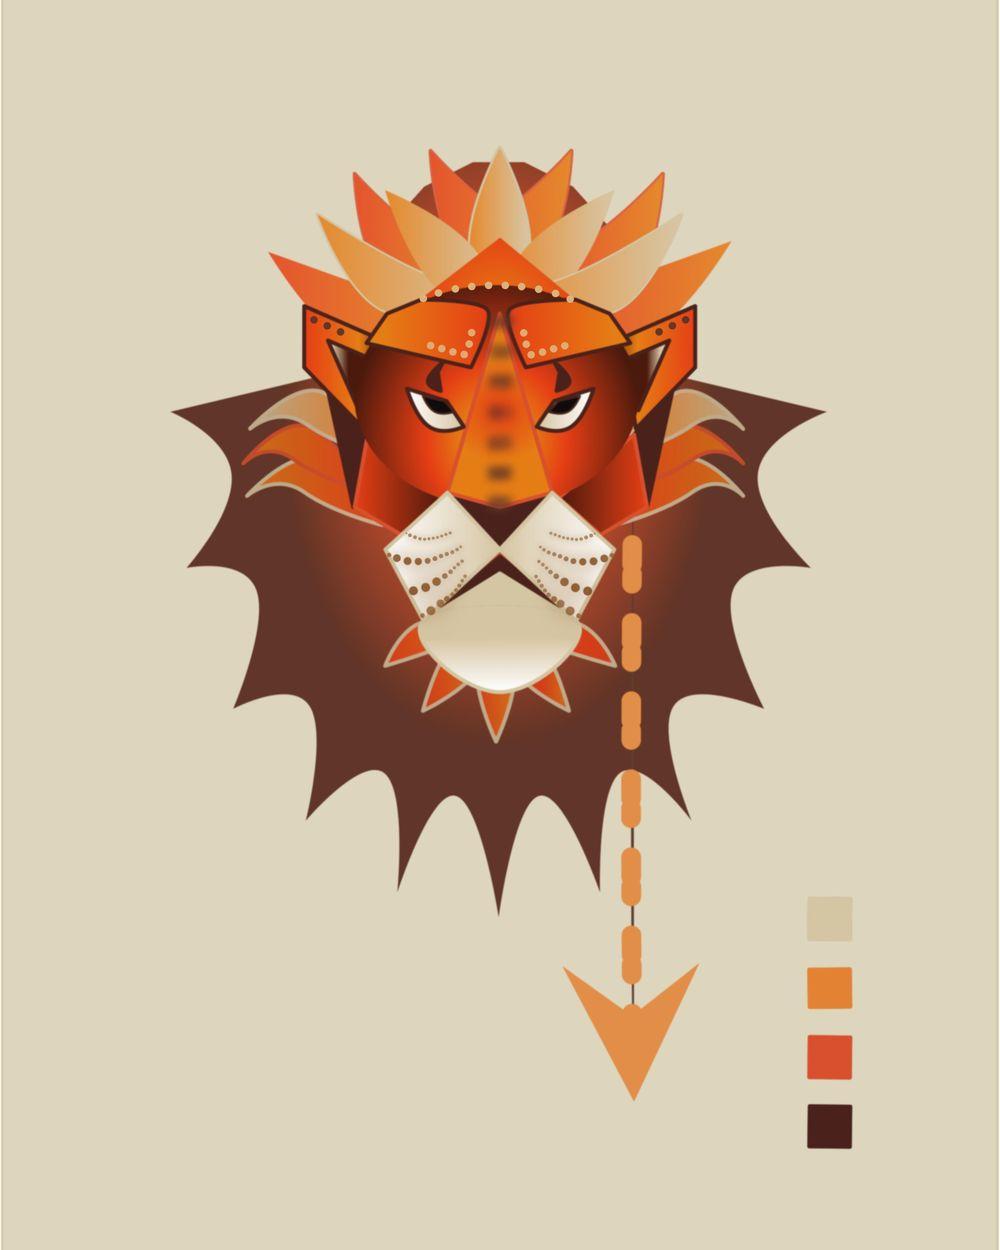 Lion - image 2 - student project